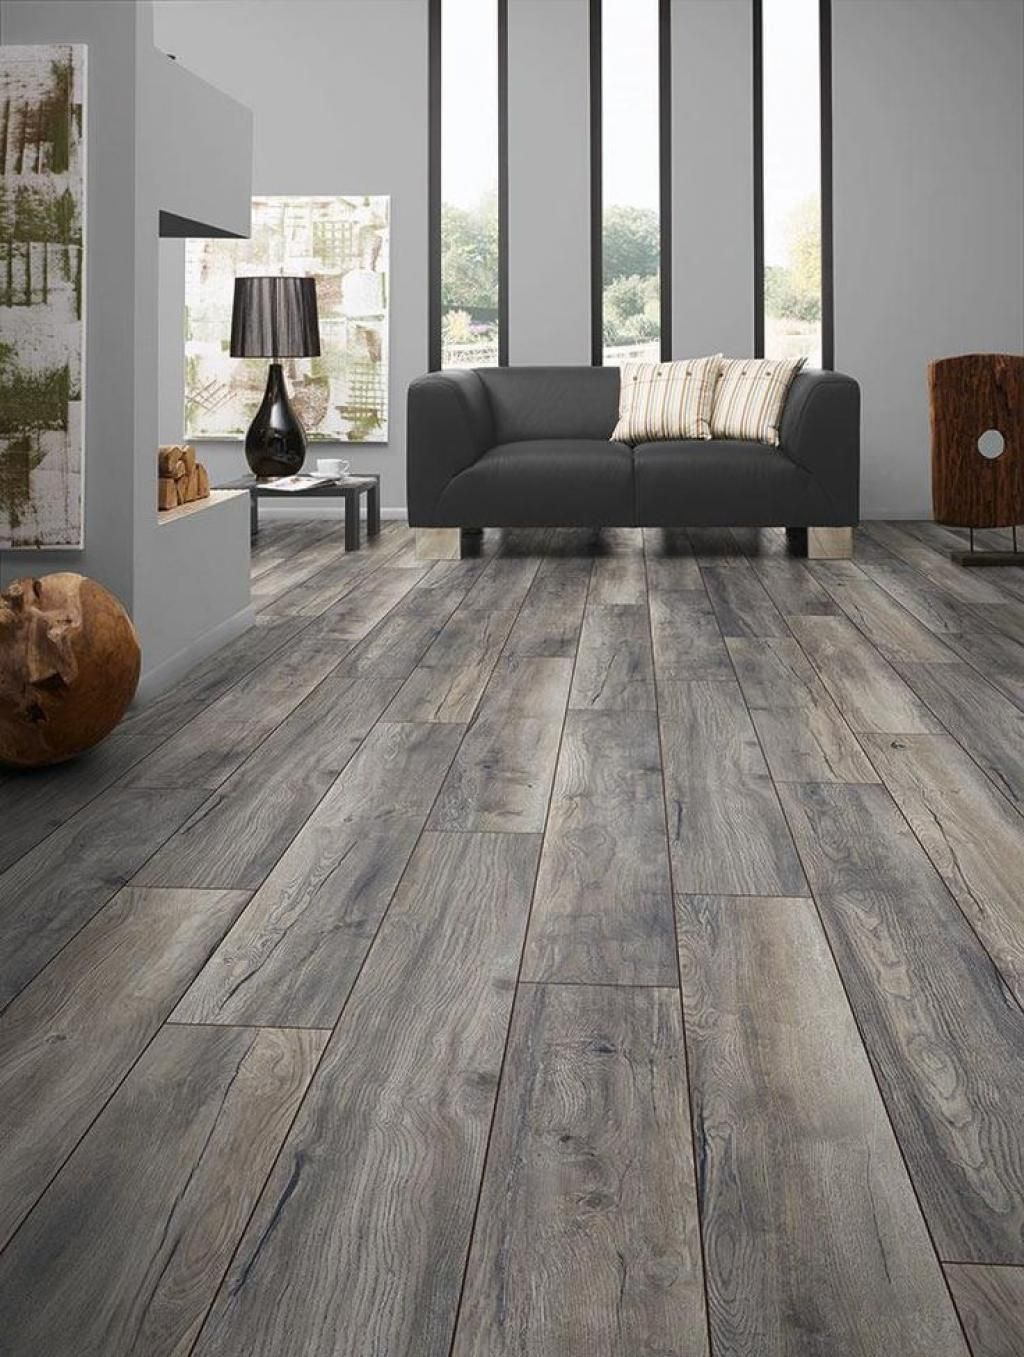 Gray Wood Tile Floor Living Room Design Furniture Arrangements How To Installing Laminate Flooring For The Home Pinterest Minimalist Grey Seating Area Inspiring